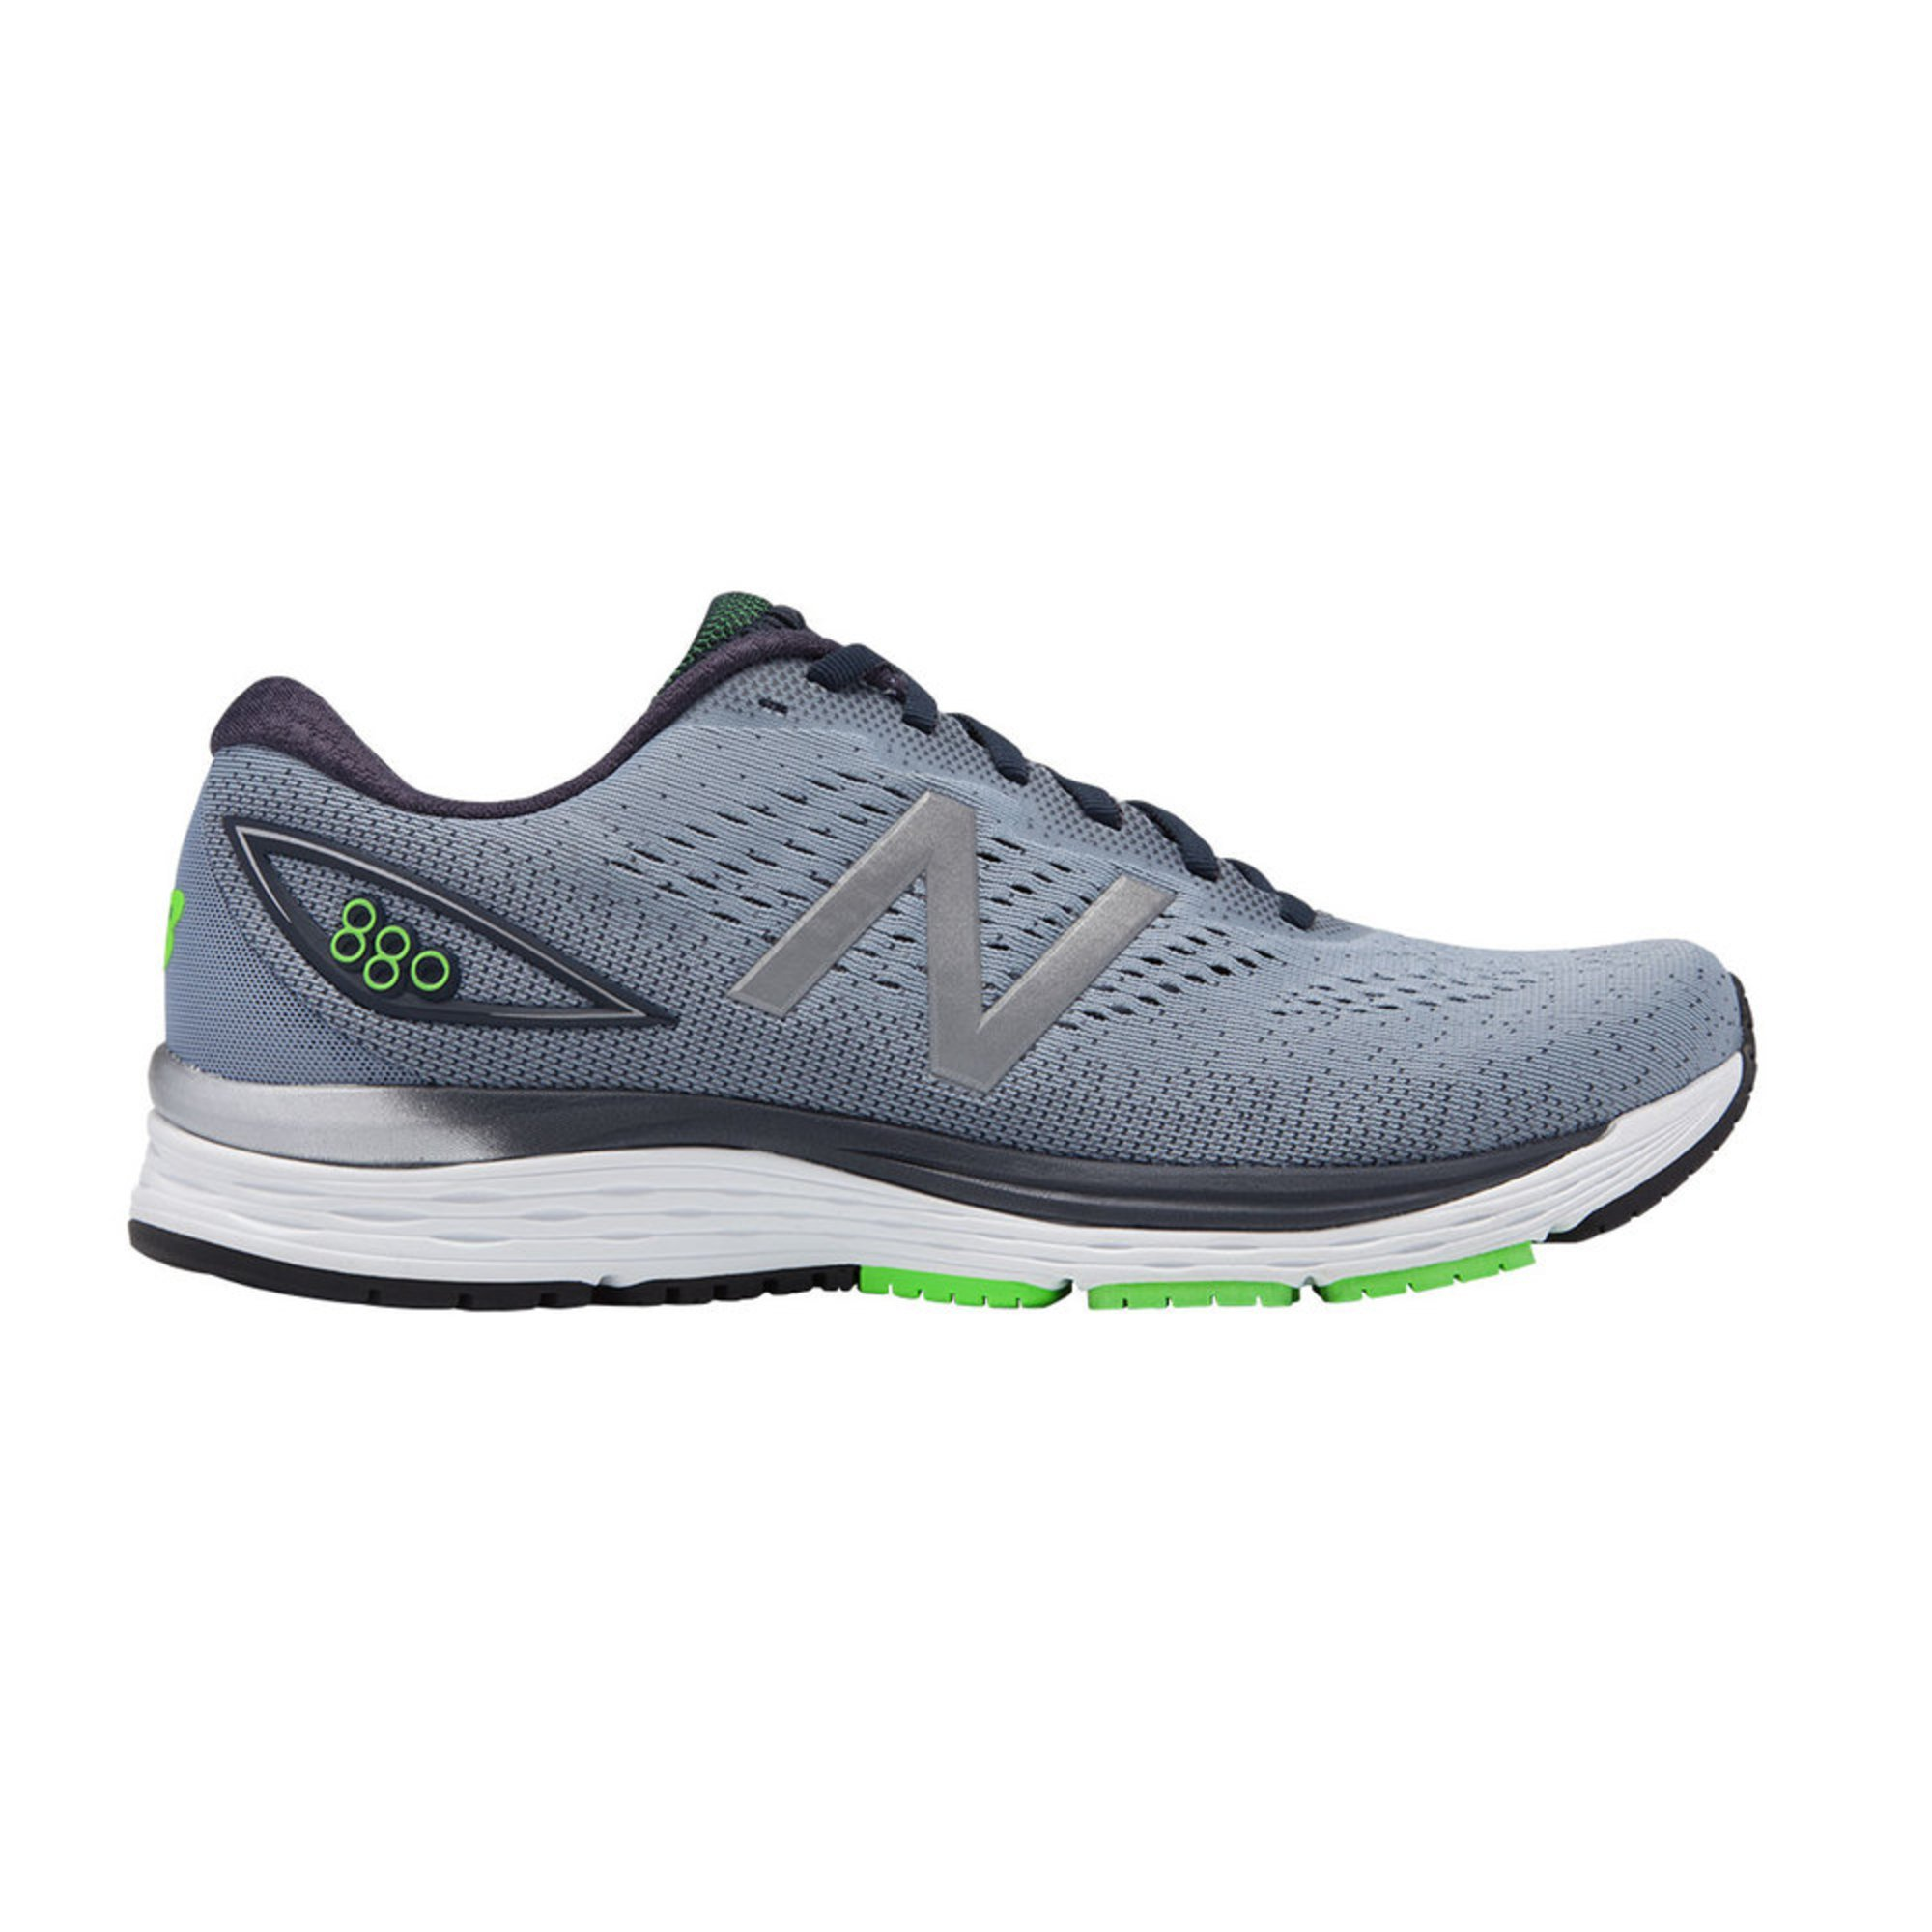 best sneakers 6b0df b7718 New Balance. New Balance Men s 880v9 Running Shoe